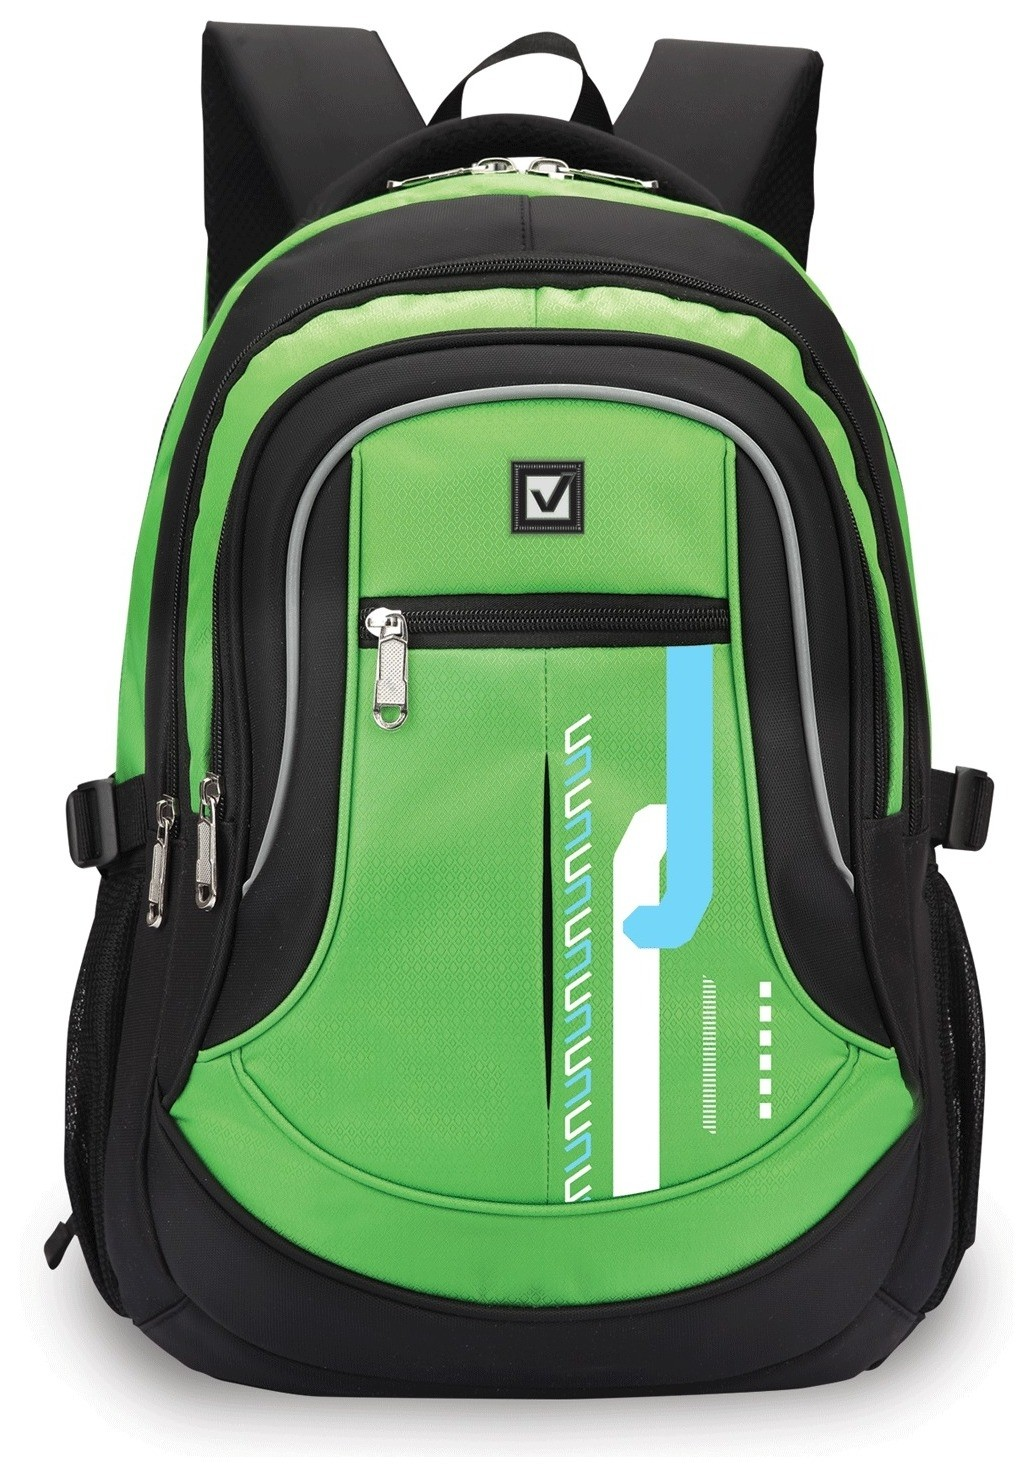 "Рюкзак BRAUBERG для старших классов/студентов/молодежи, ""Лайм"", 30 литров, 46х34х18 см  Brauberg"